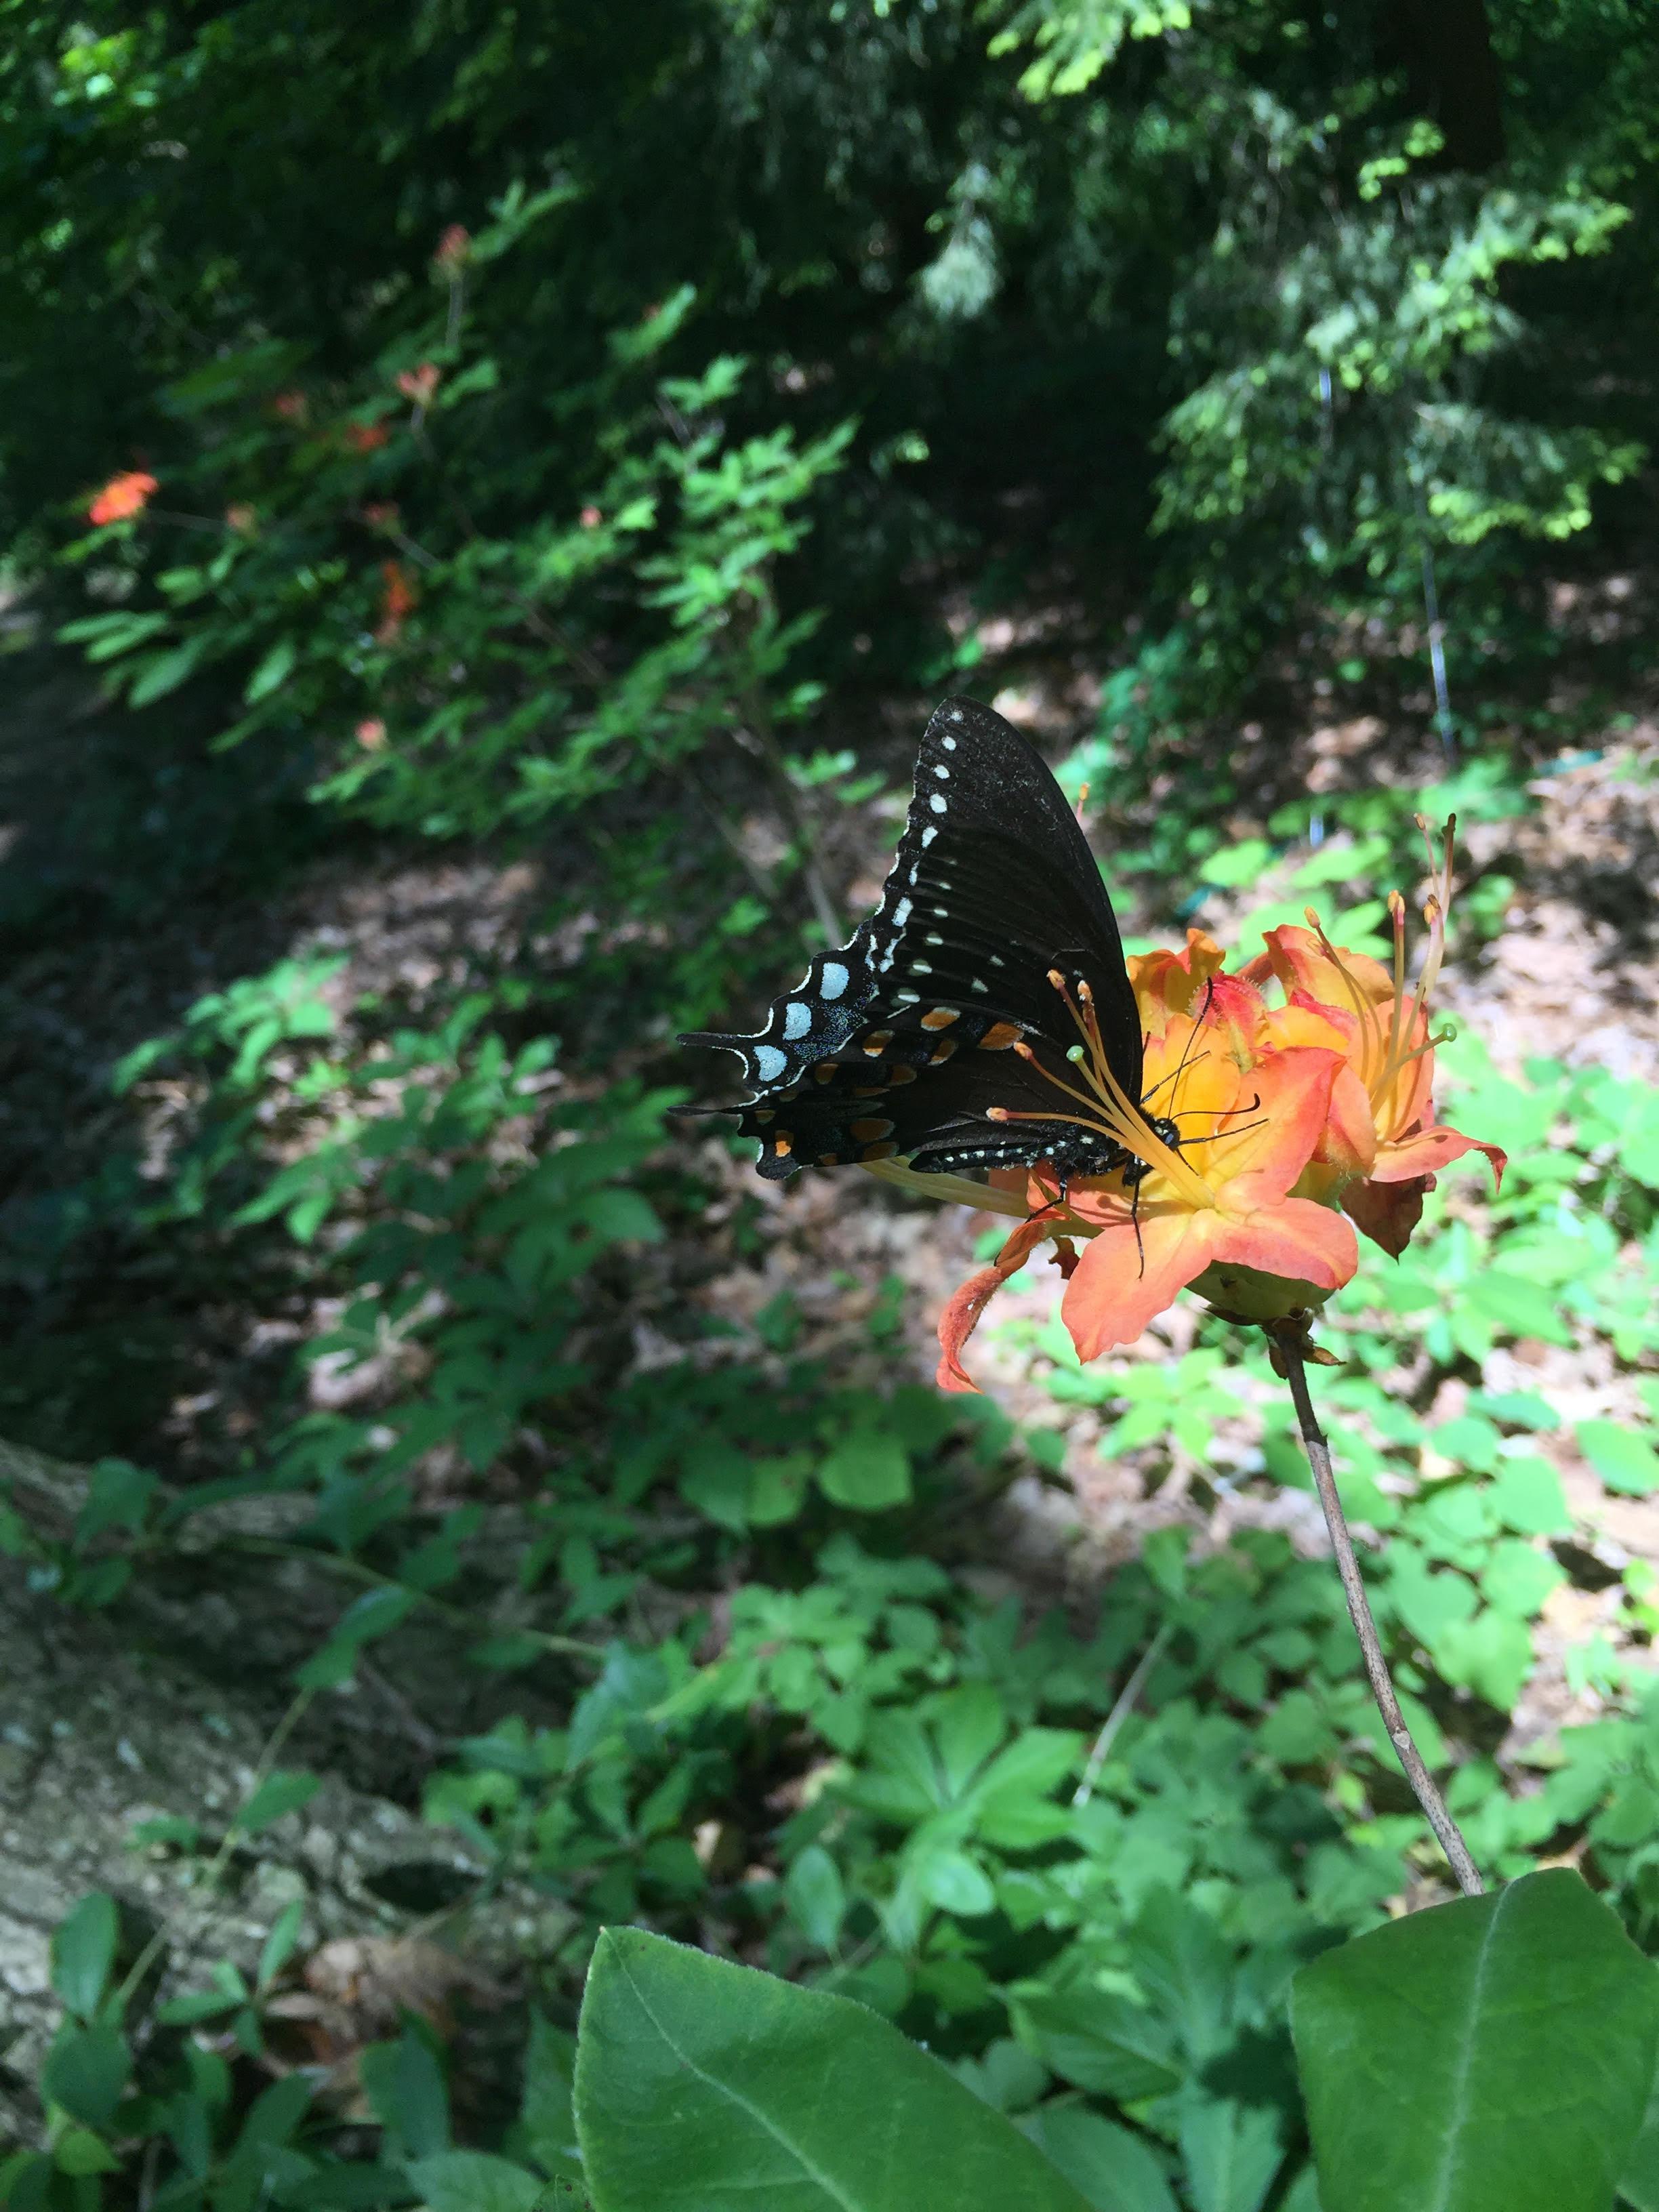 Plant, Pollinator, Butterfly, Arthropod